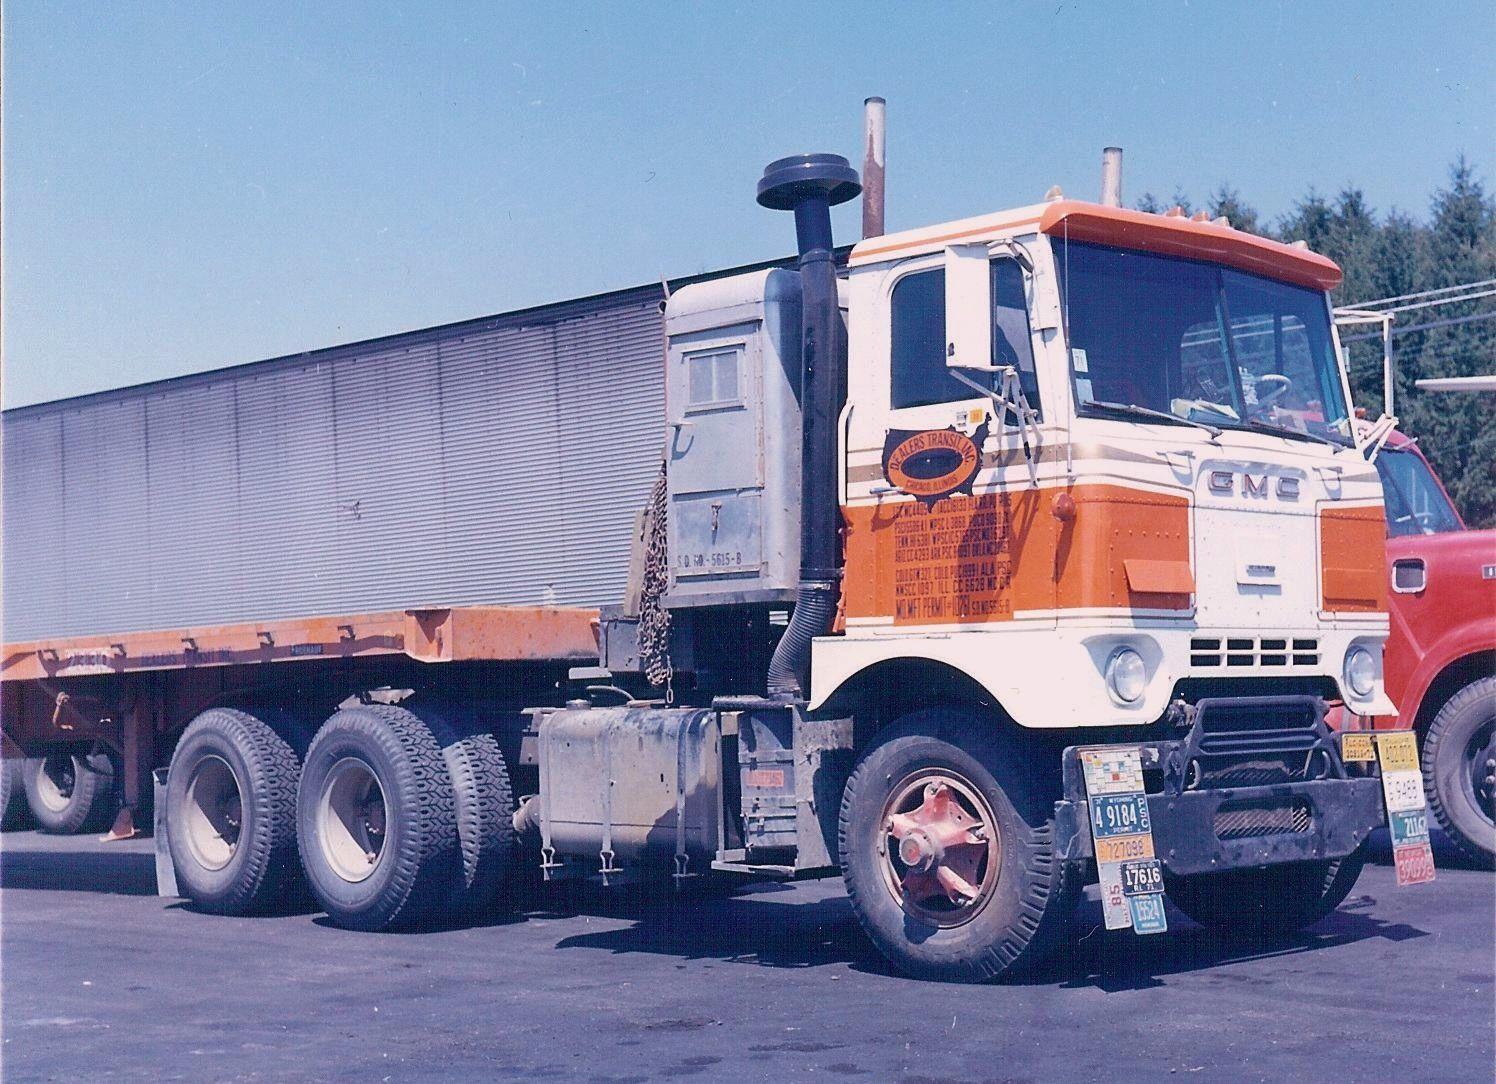 Gmc Cracker Box With Sleeper Trucks Big Trucks Vintage Trucks